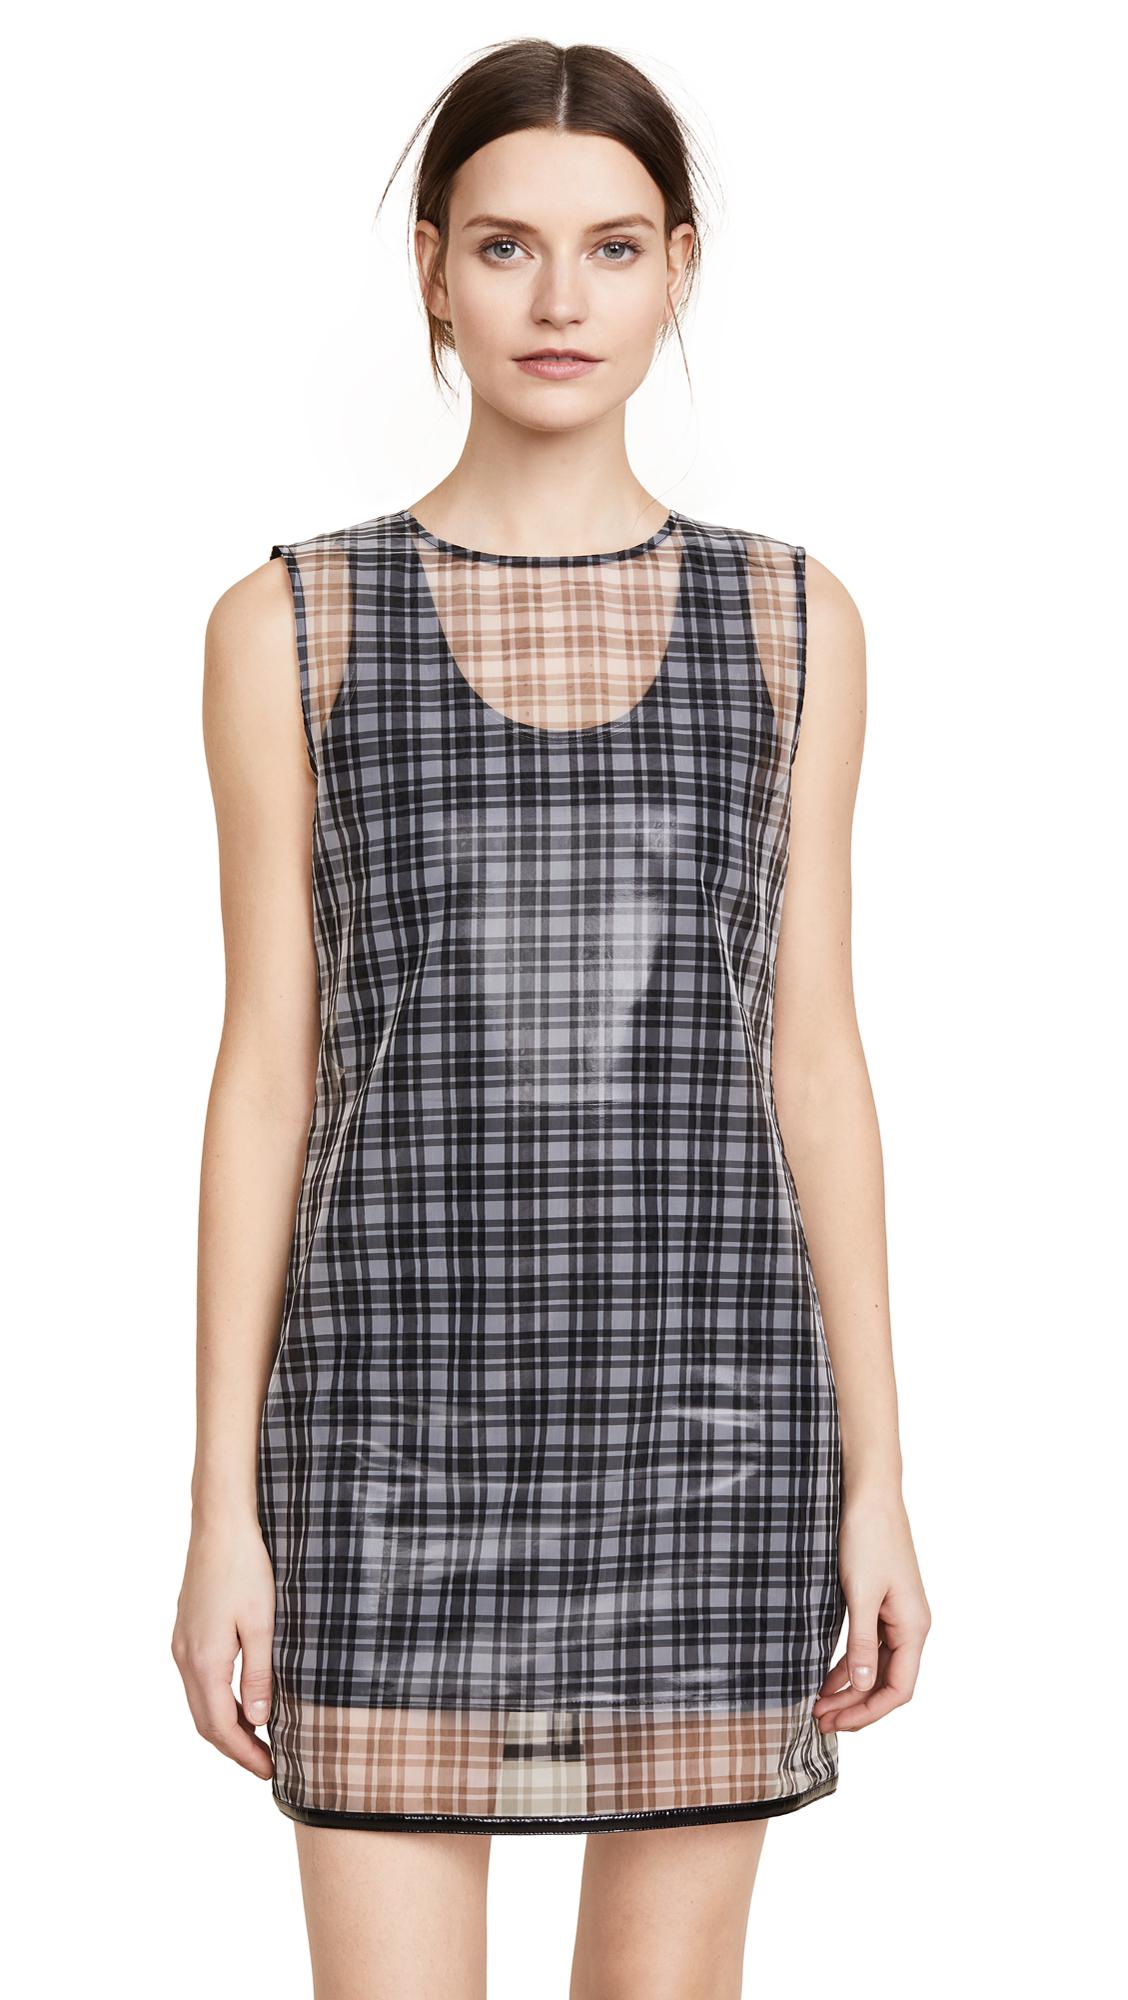 Helmut Lang Plaid Shell Dress In Black Multi